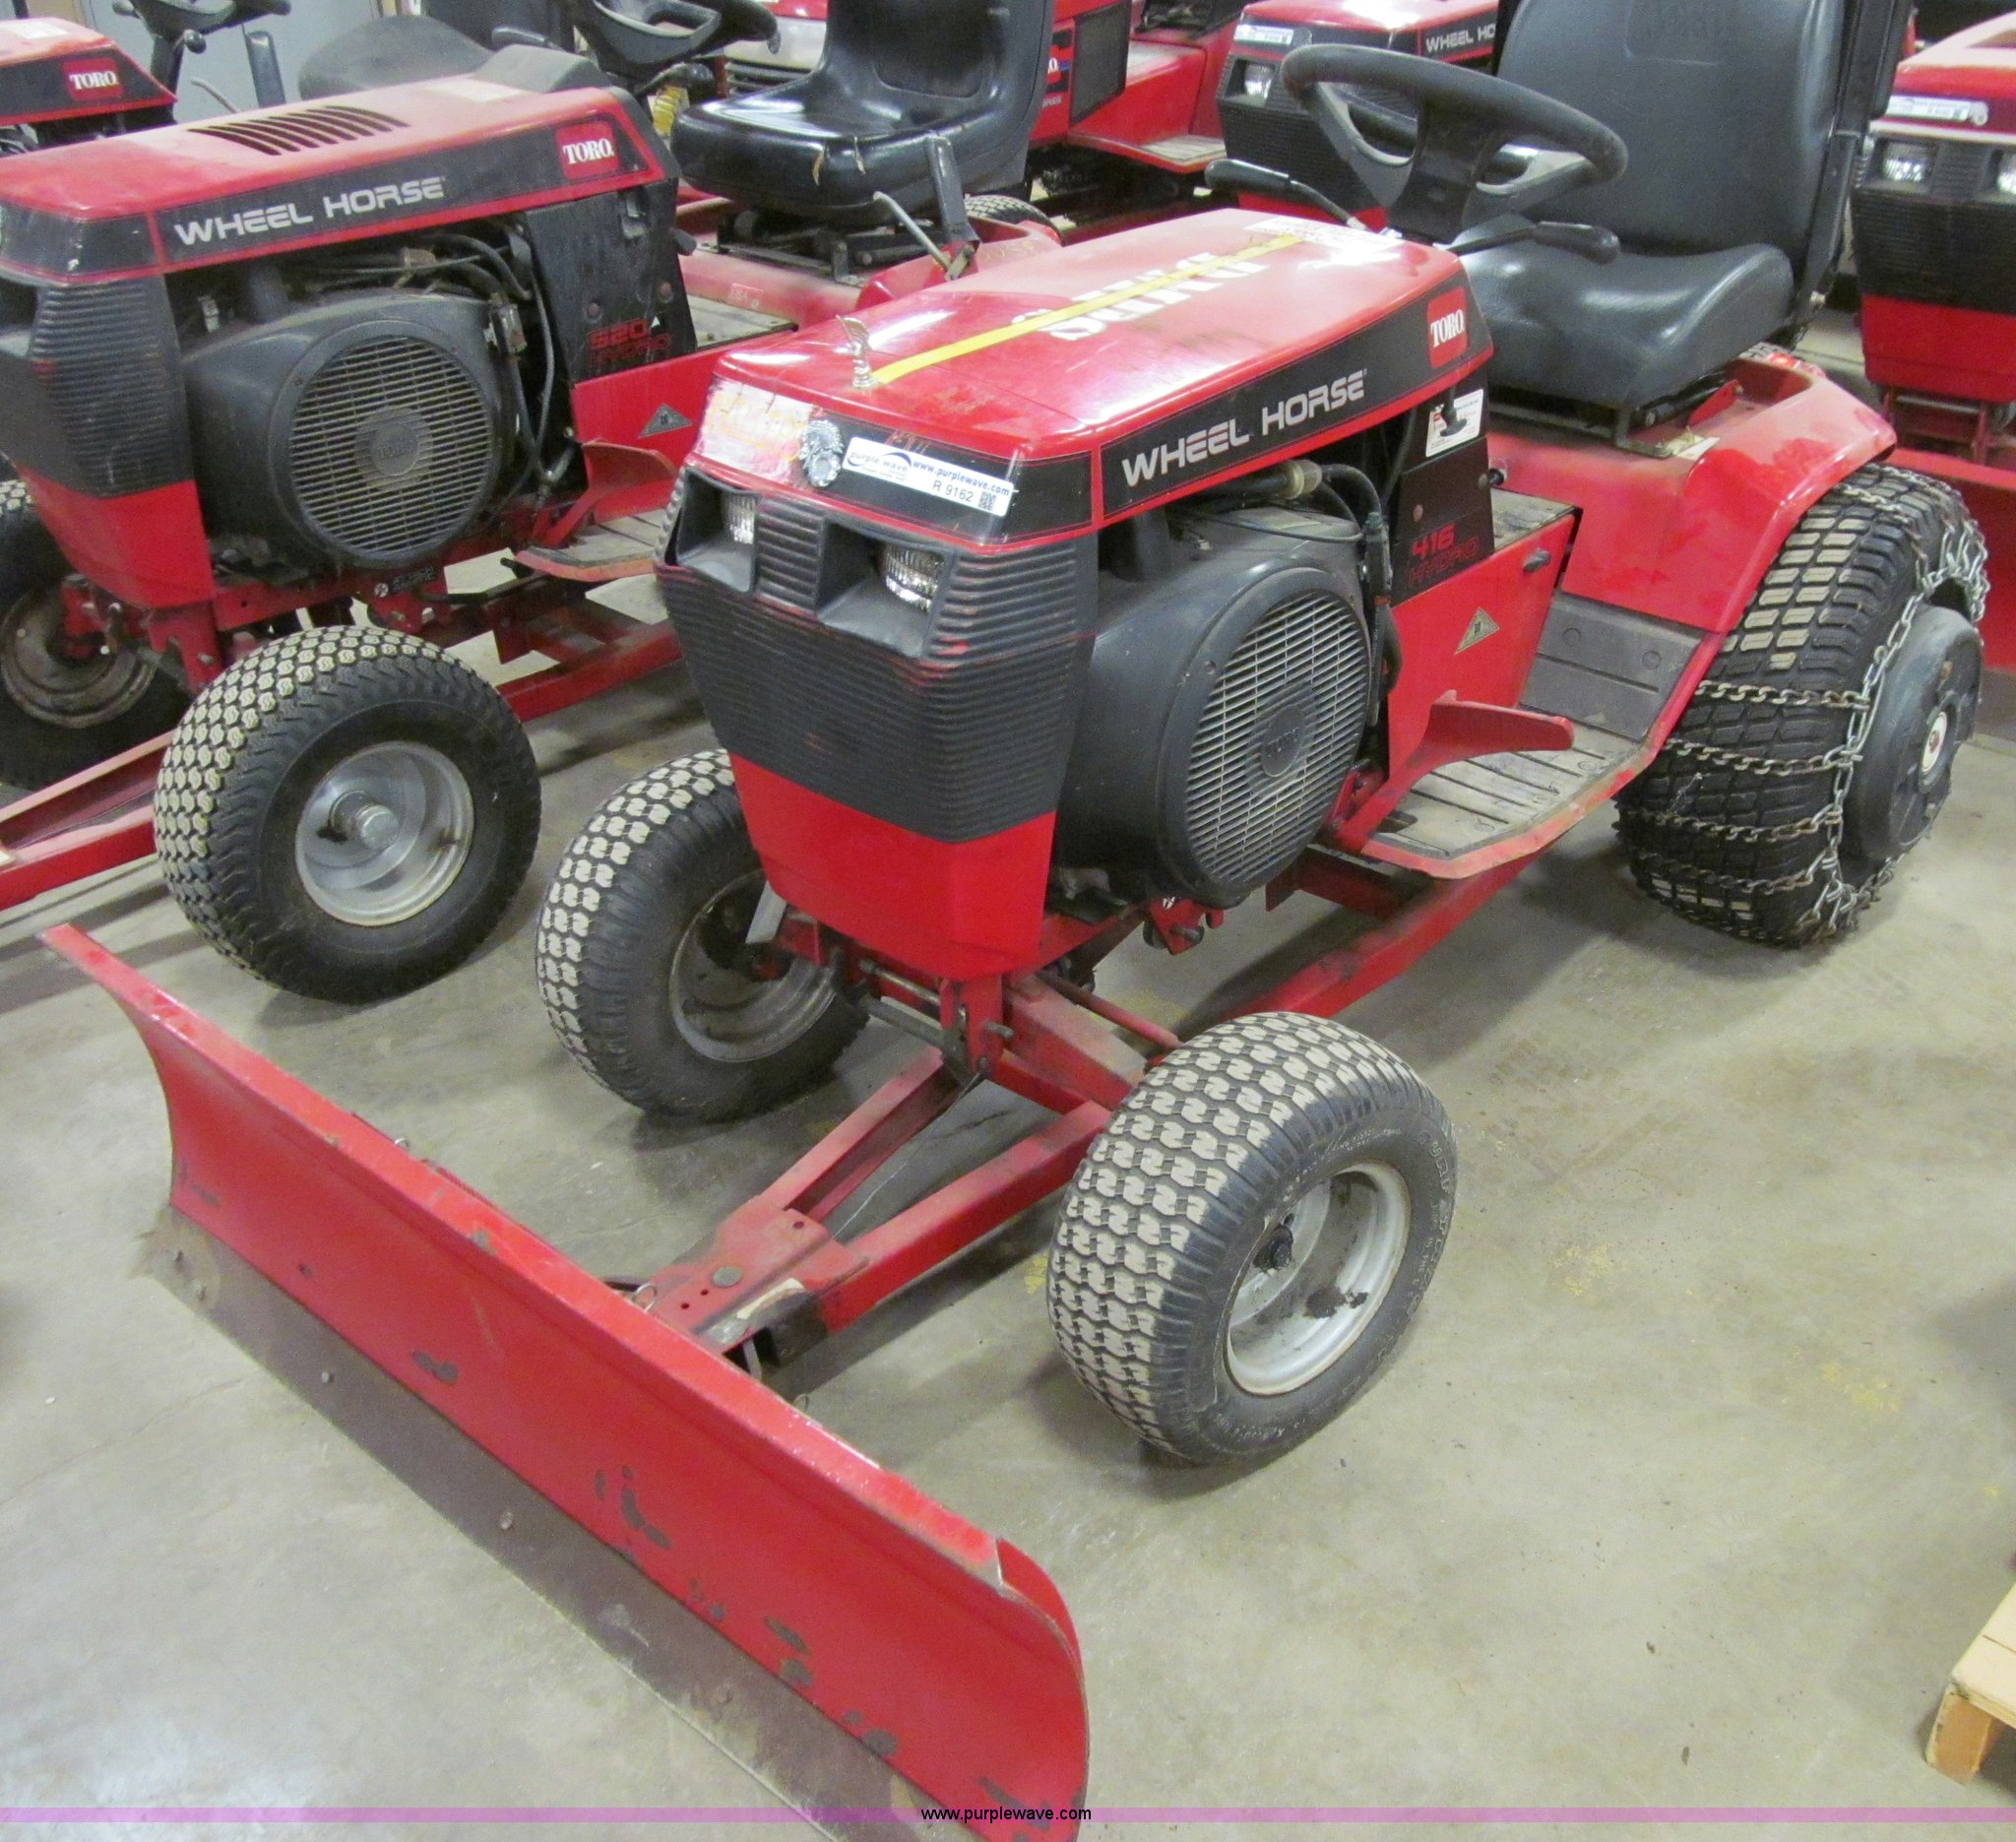 toro 416 hydro wheel horse garden tractor item r9162 sol